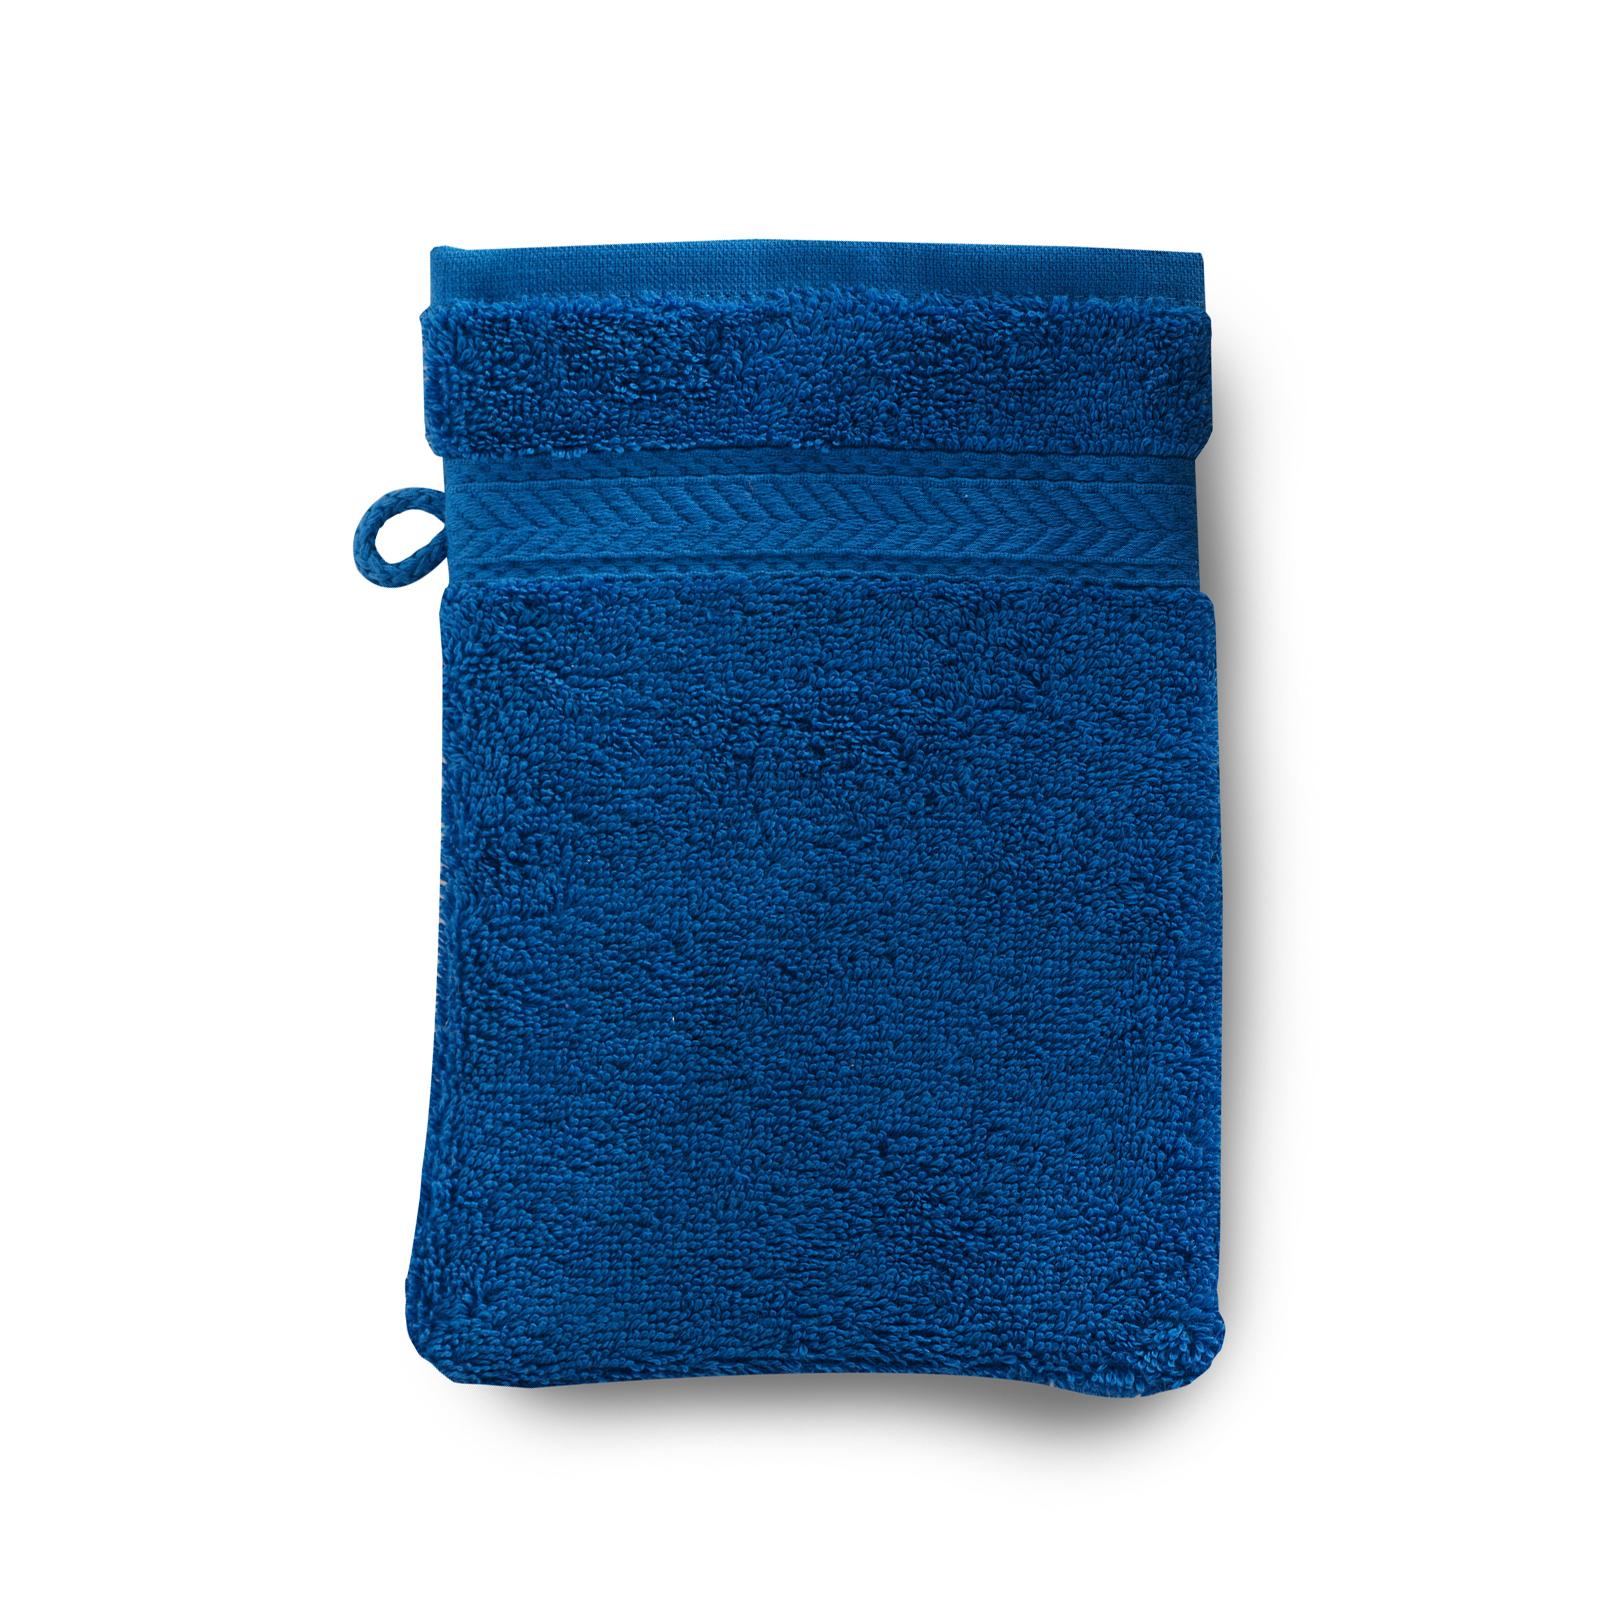 Luxus-Handtuecher-Gaestetuch-Handtuch-Duschtuch-500-g-m-Frottee-Baumwolle-NEU